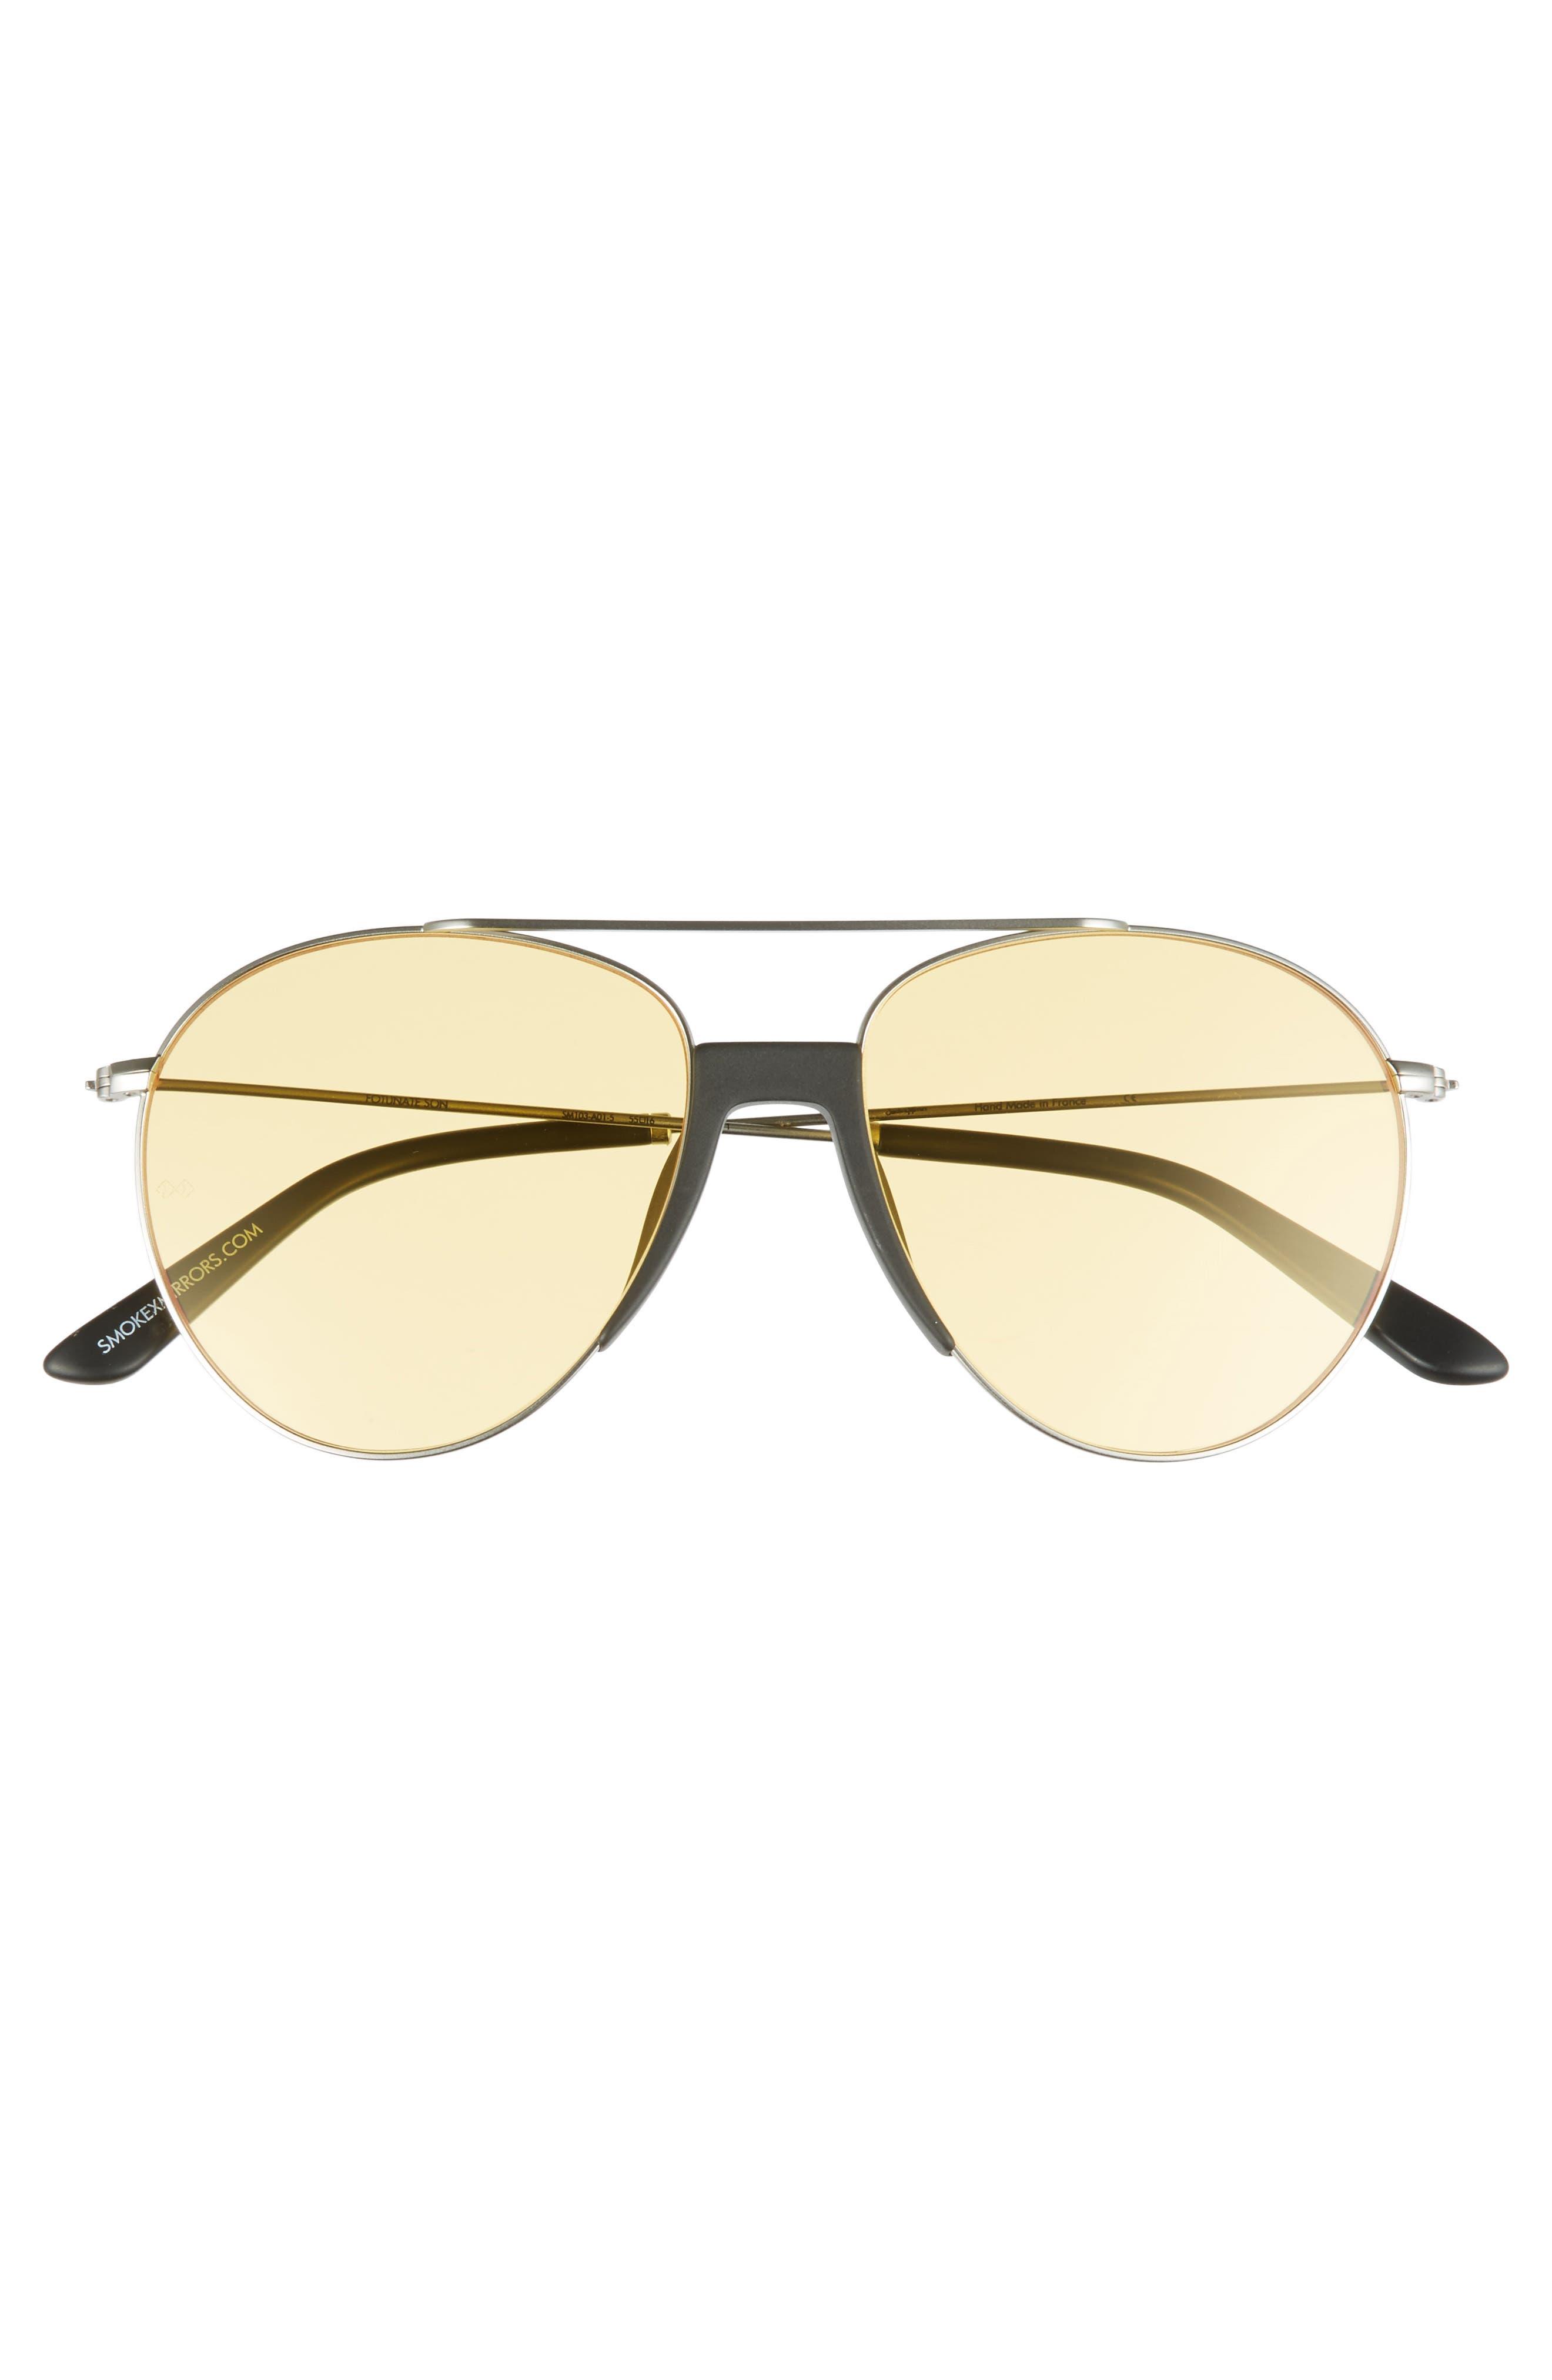 Fortunate Son 53mm Aviator Sunglasses,                             Alternate thumbnail 2, color,                             001